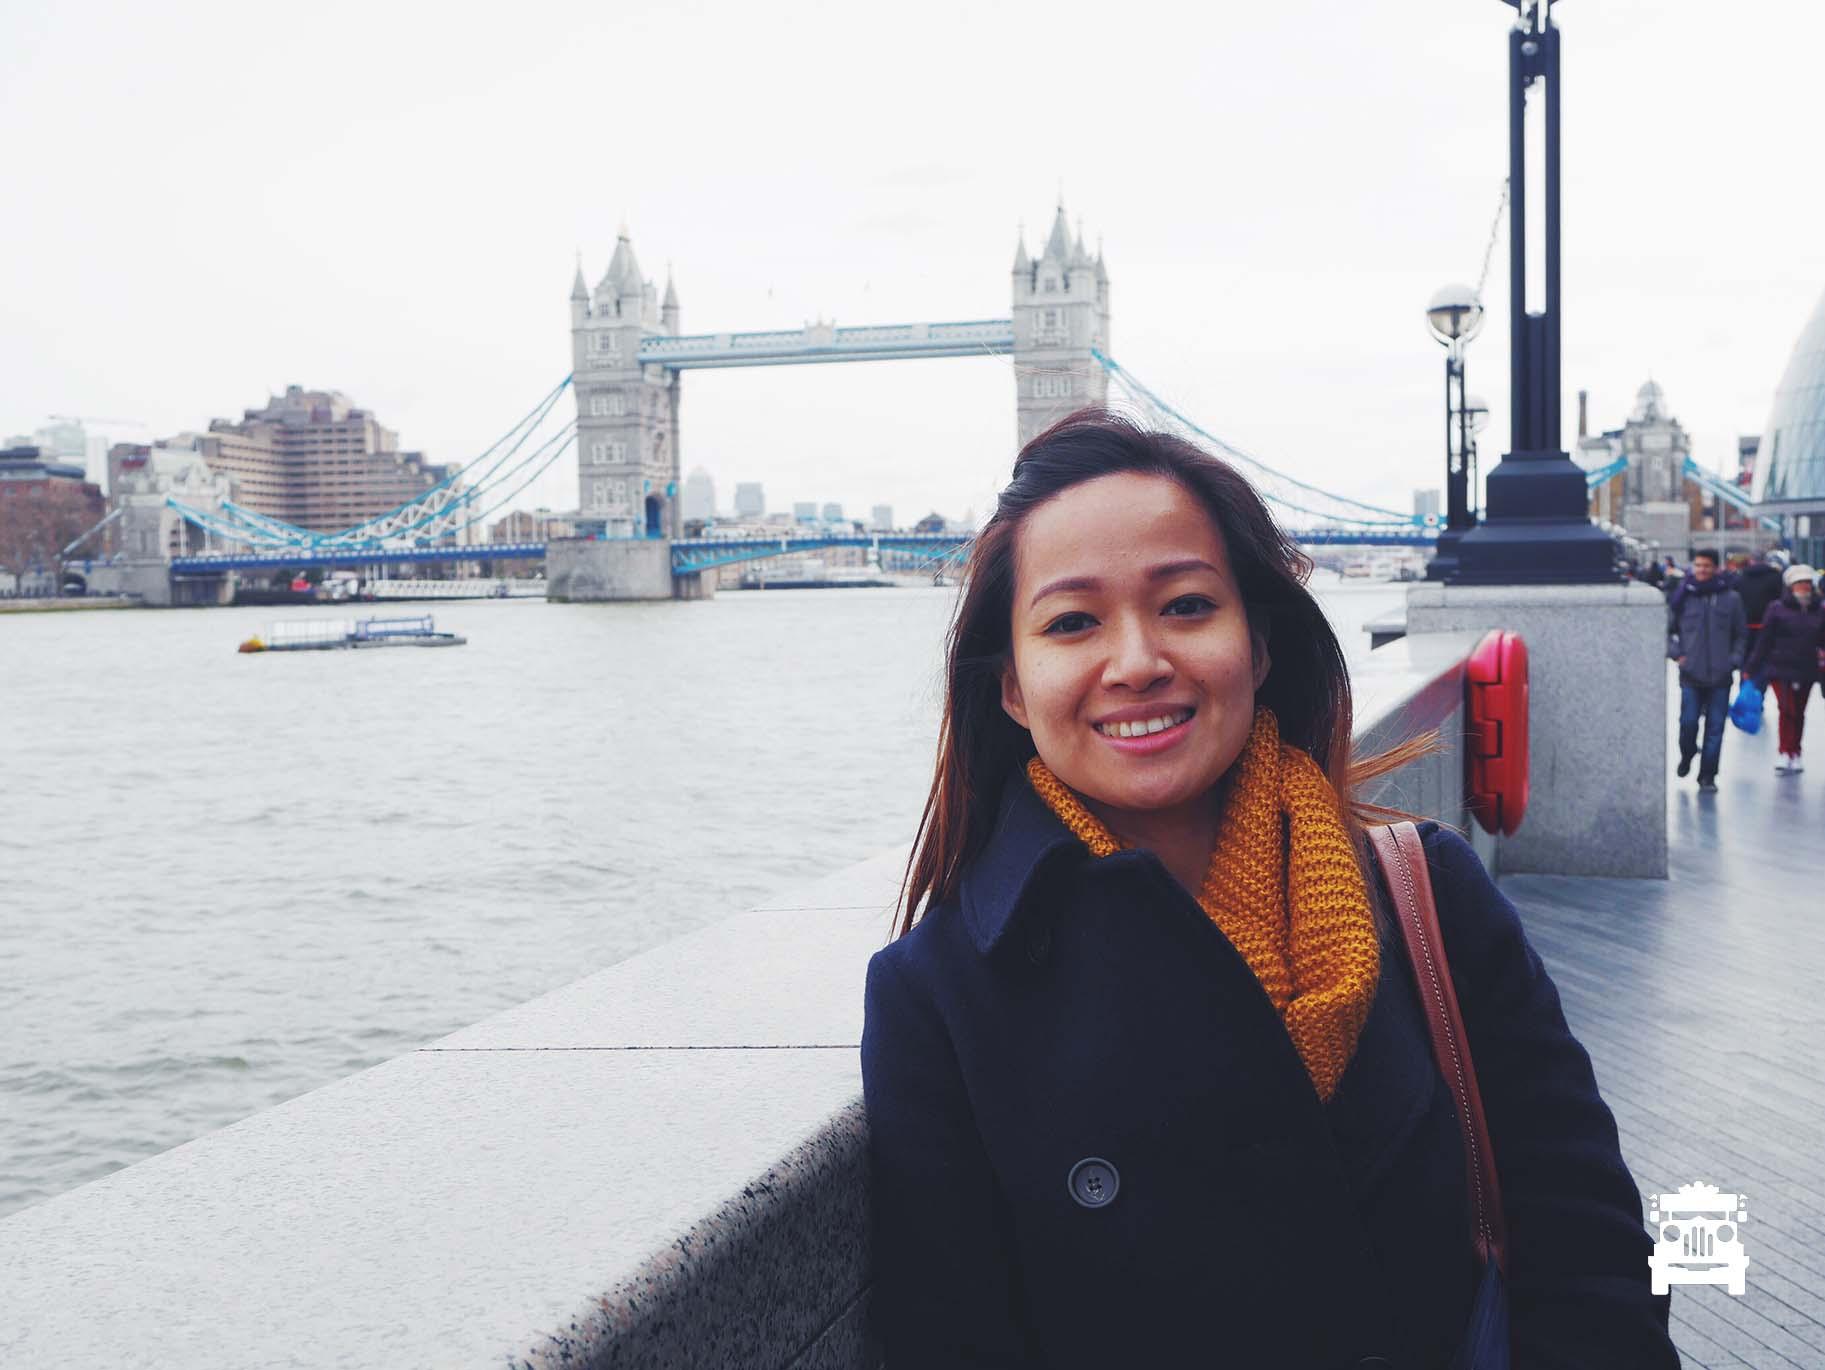 Tower Bridge is not falling down, my fair lady :D